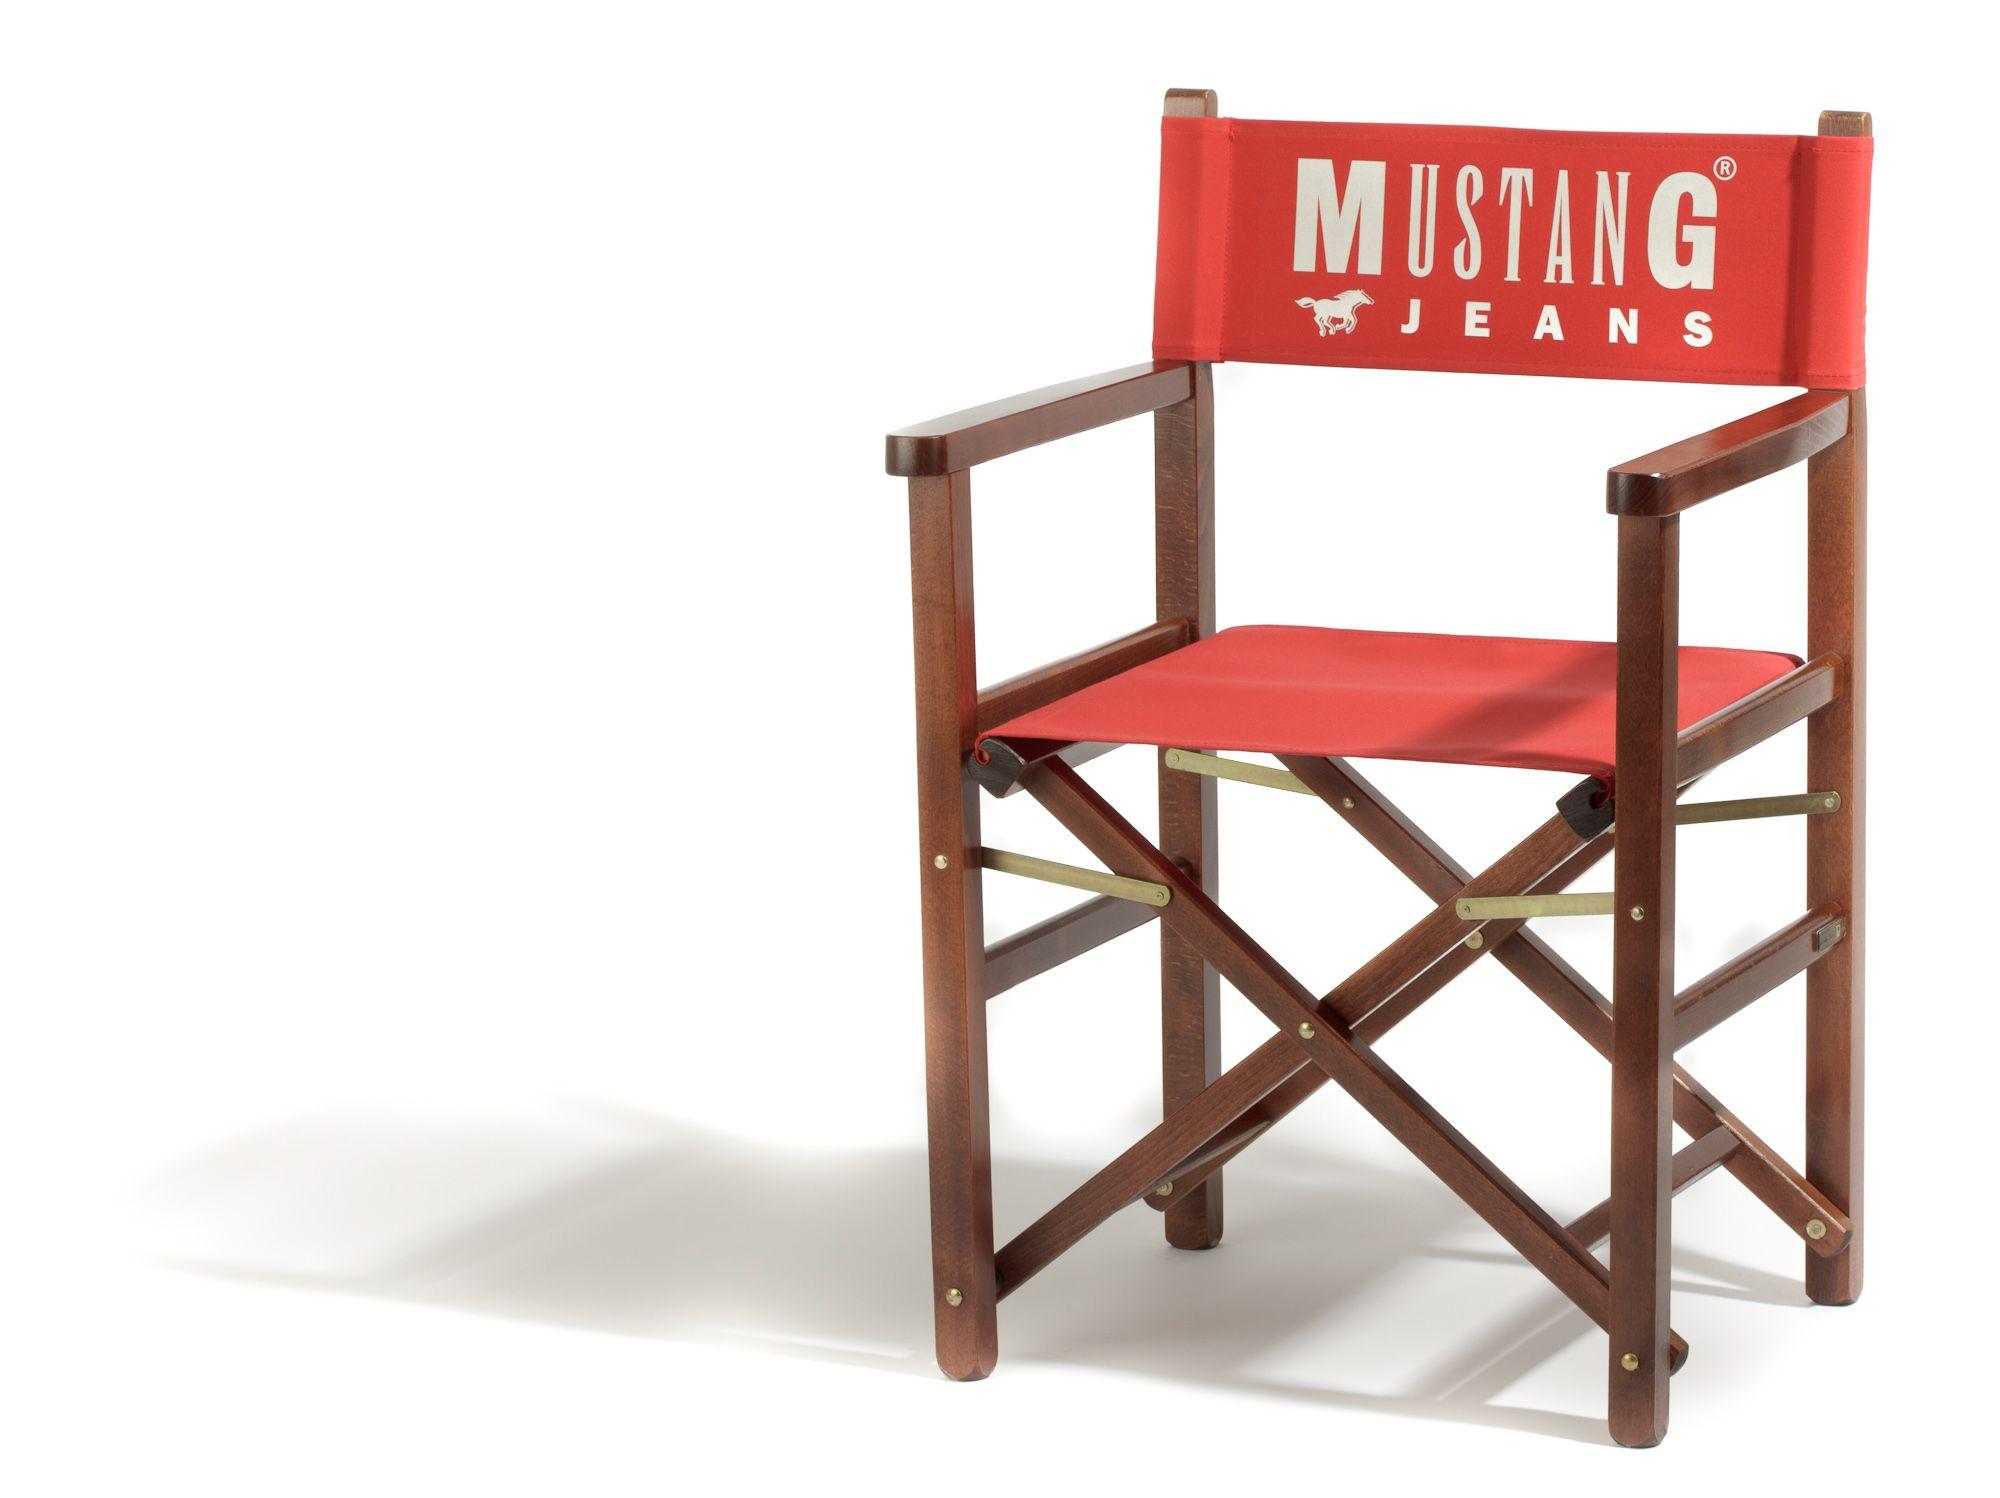 regiestuhl oscar mit mustang branding. Black Bedroom Furniture Sets. Home Design Ideas